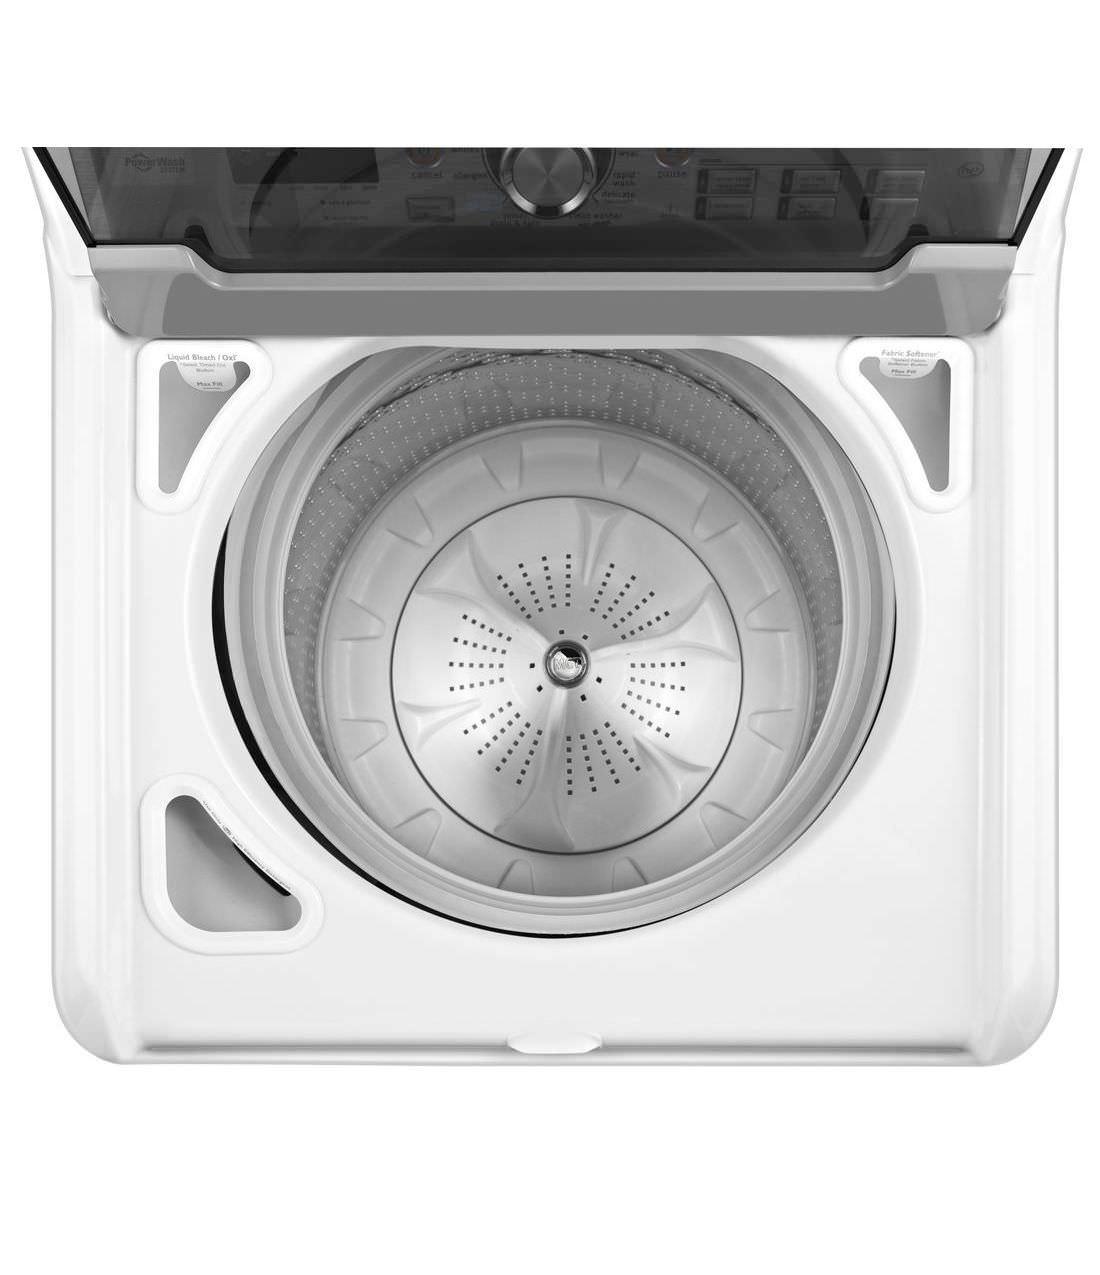 Top Loading Washing Machine Mvwb725bw Maytag Built In Energy Star